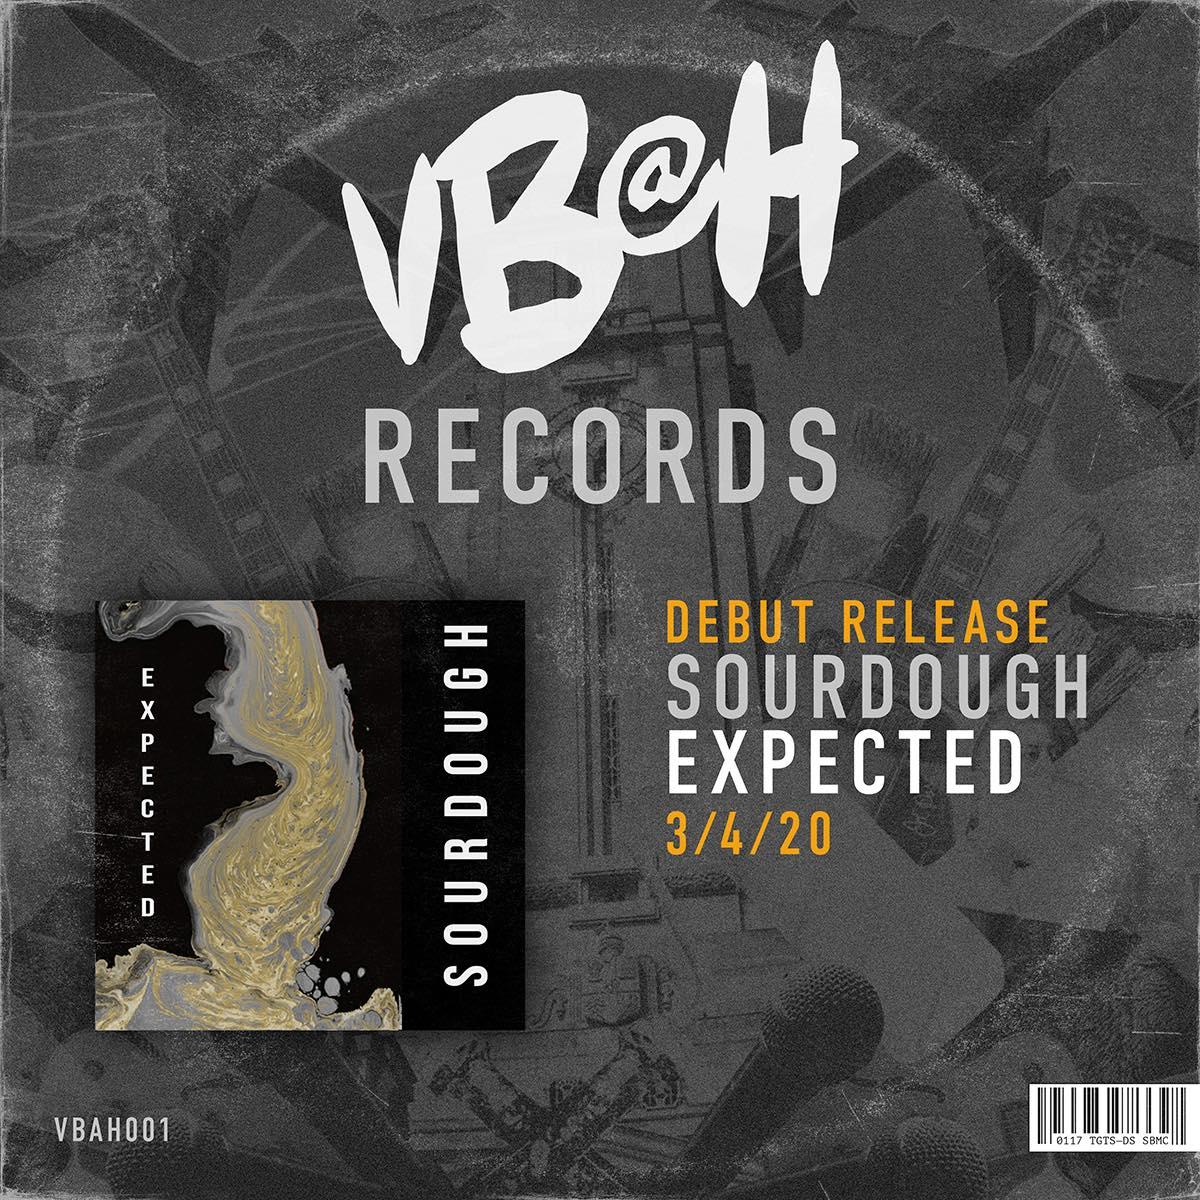 VBAH  Records Debut release